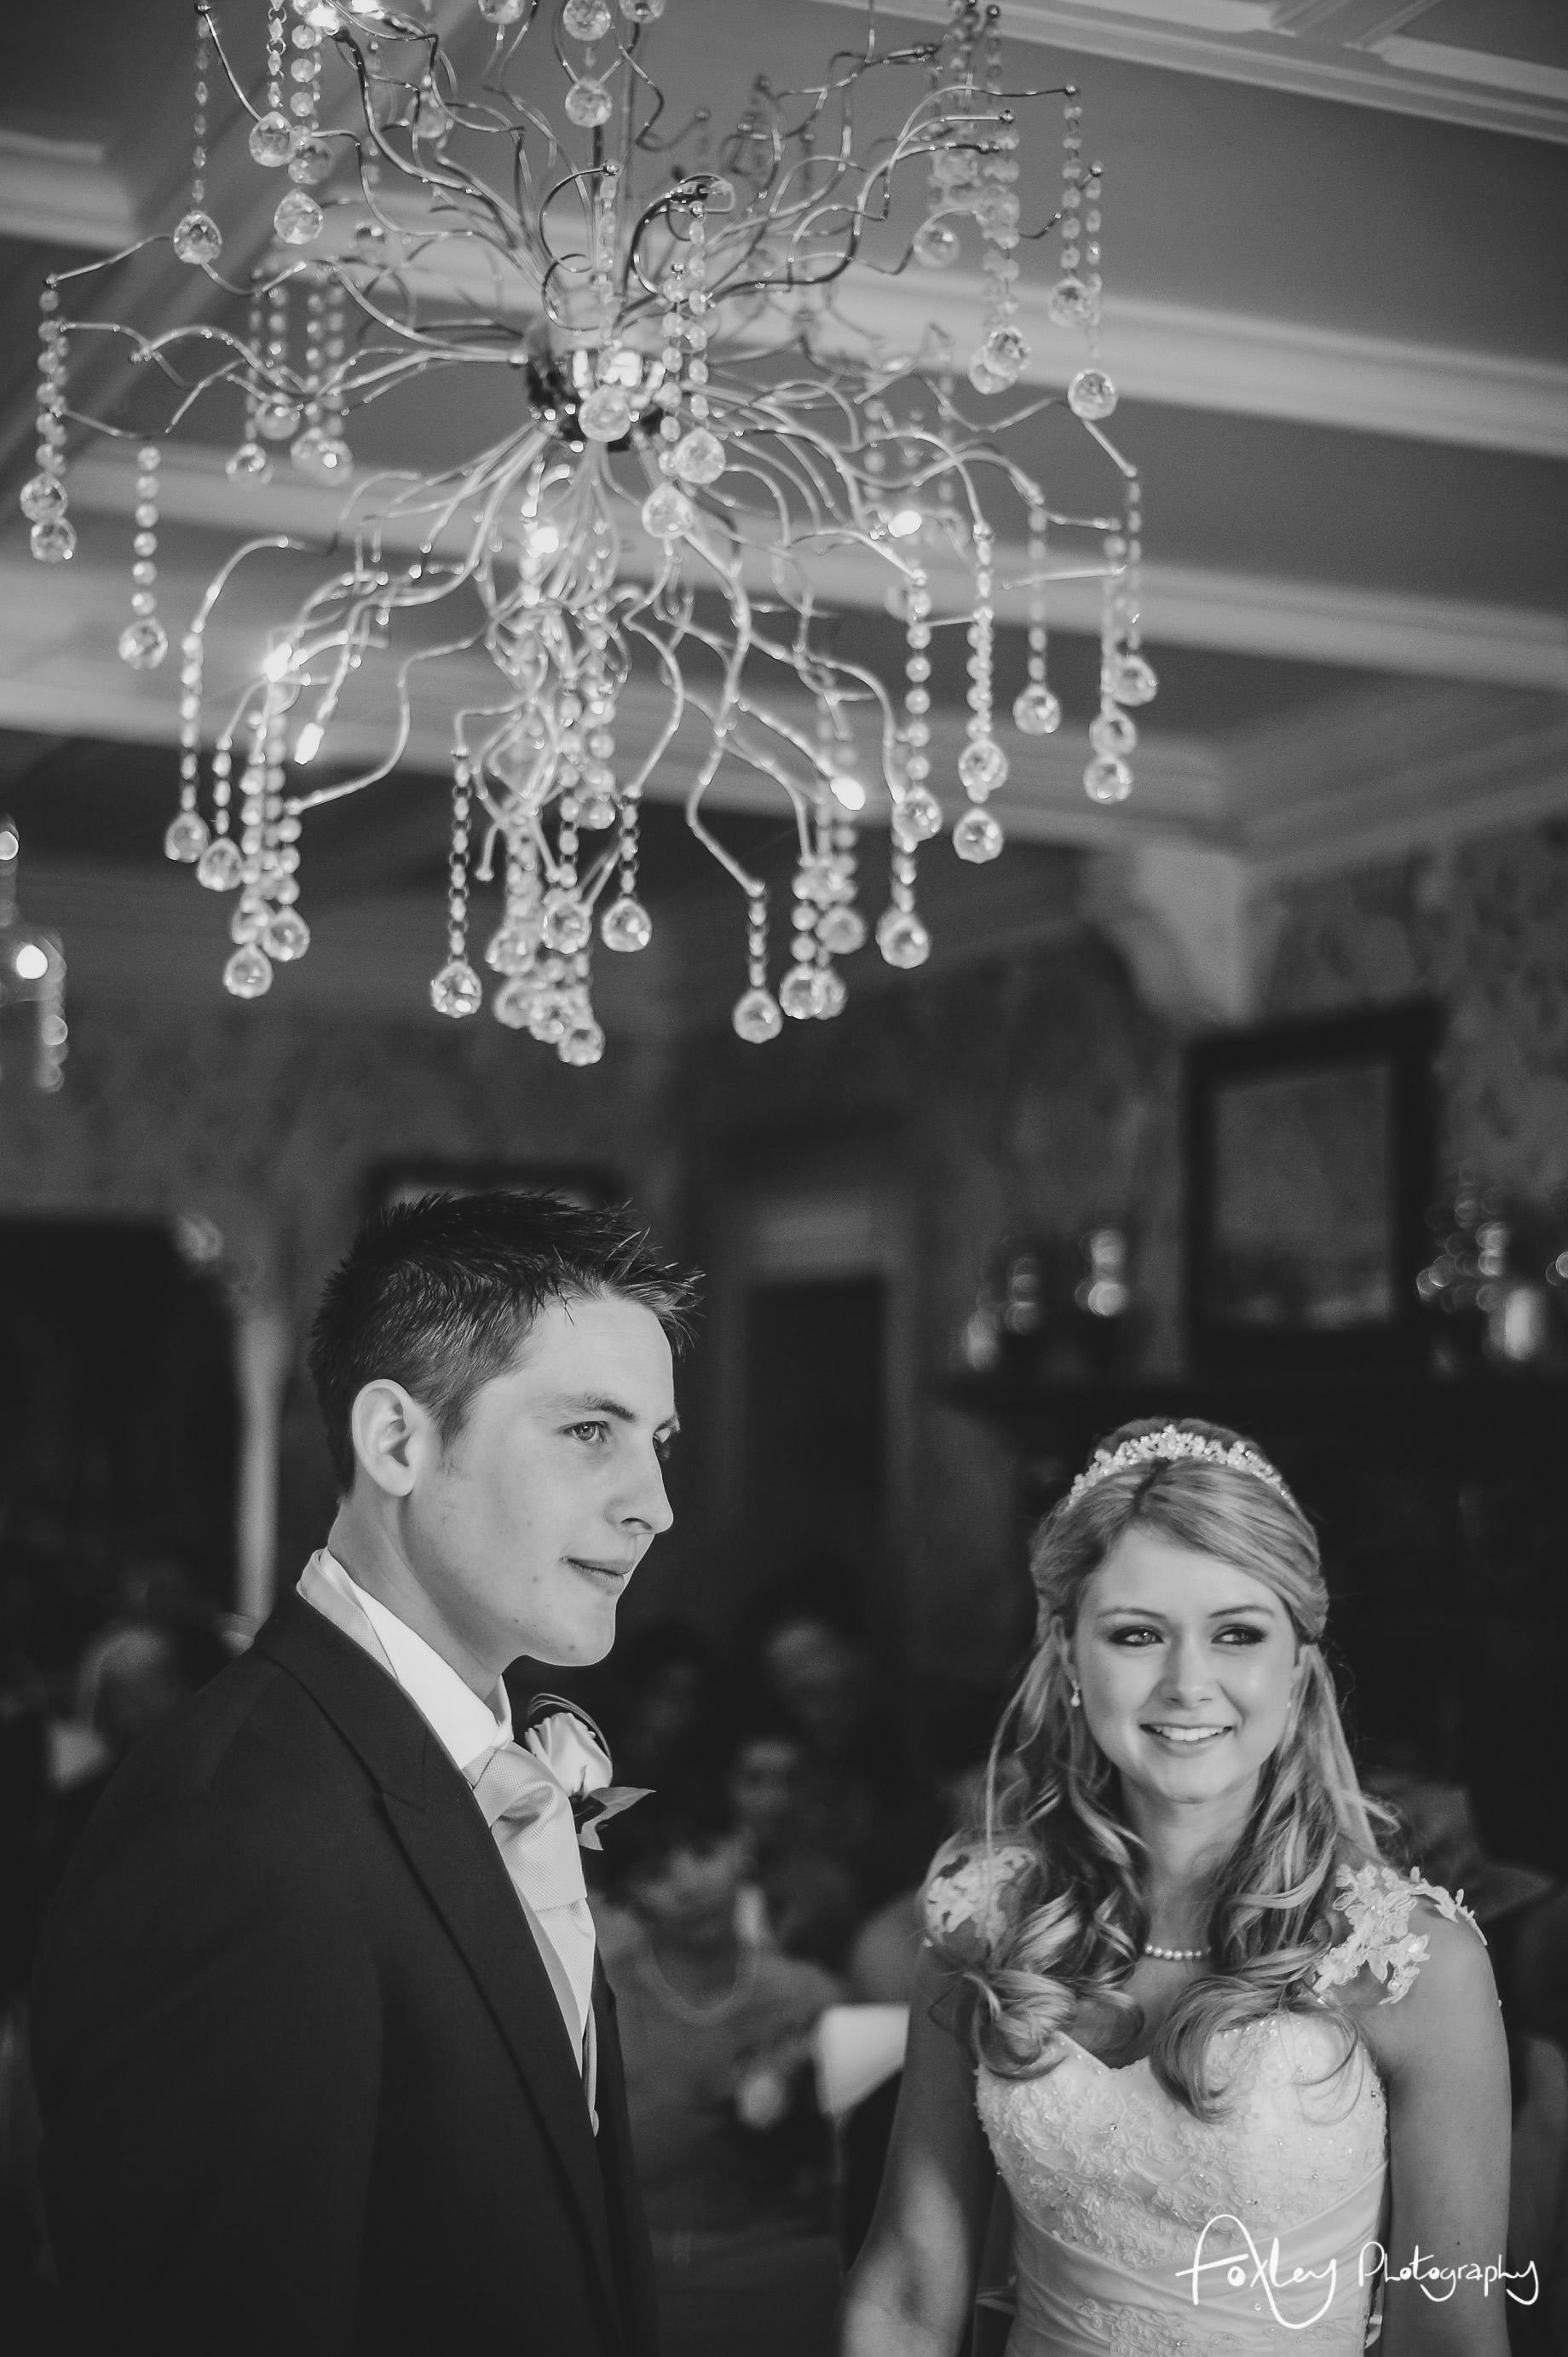 Gemma and Lewis' Wedding at Mitton Hall 083